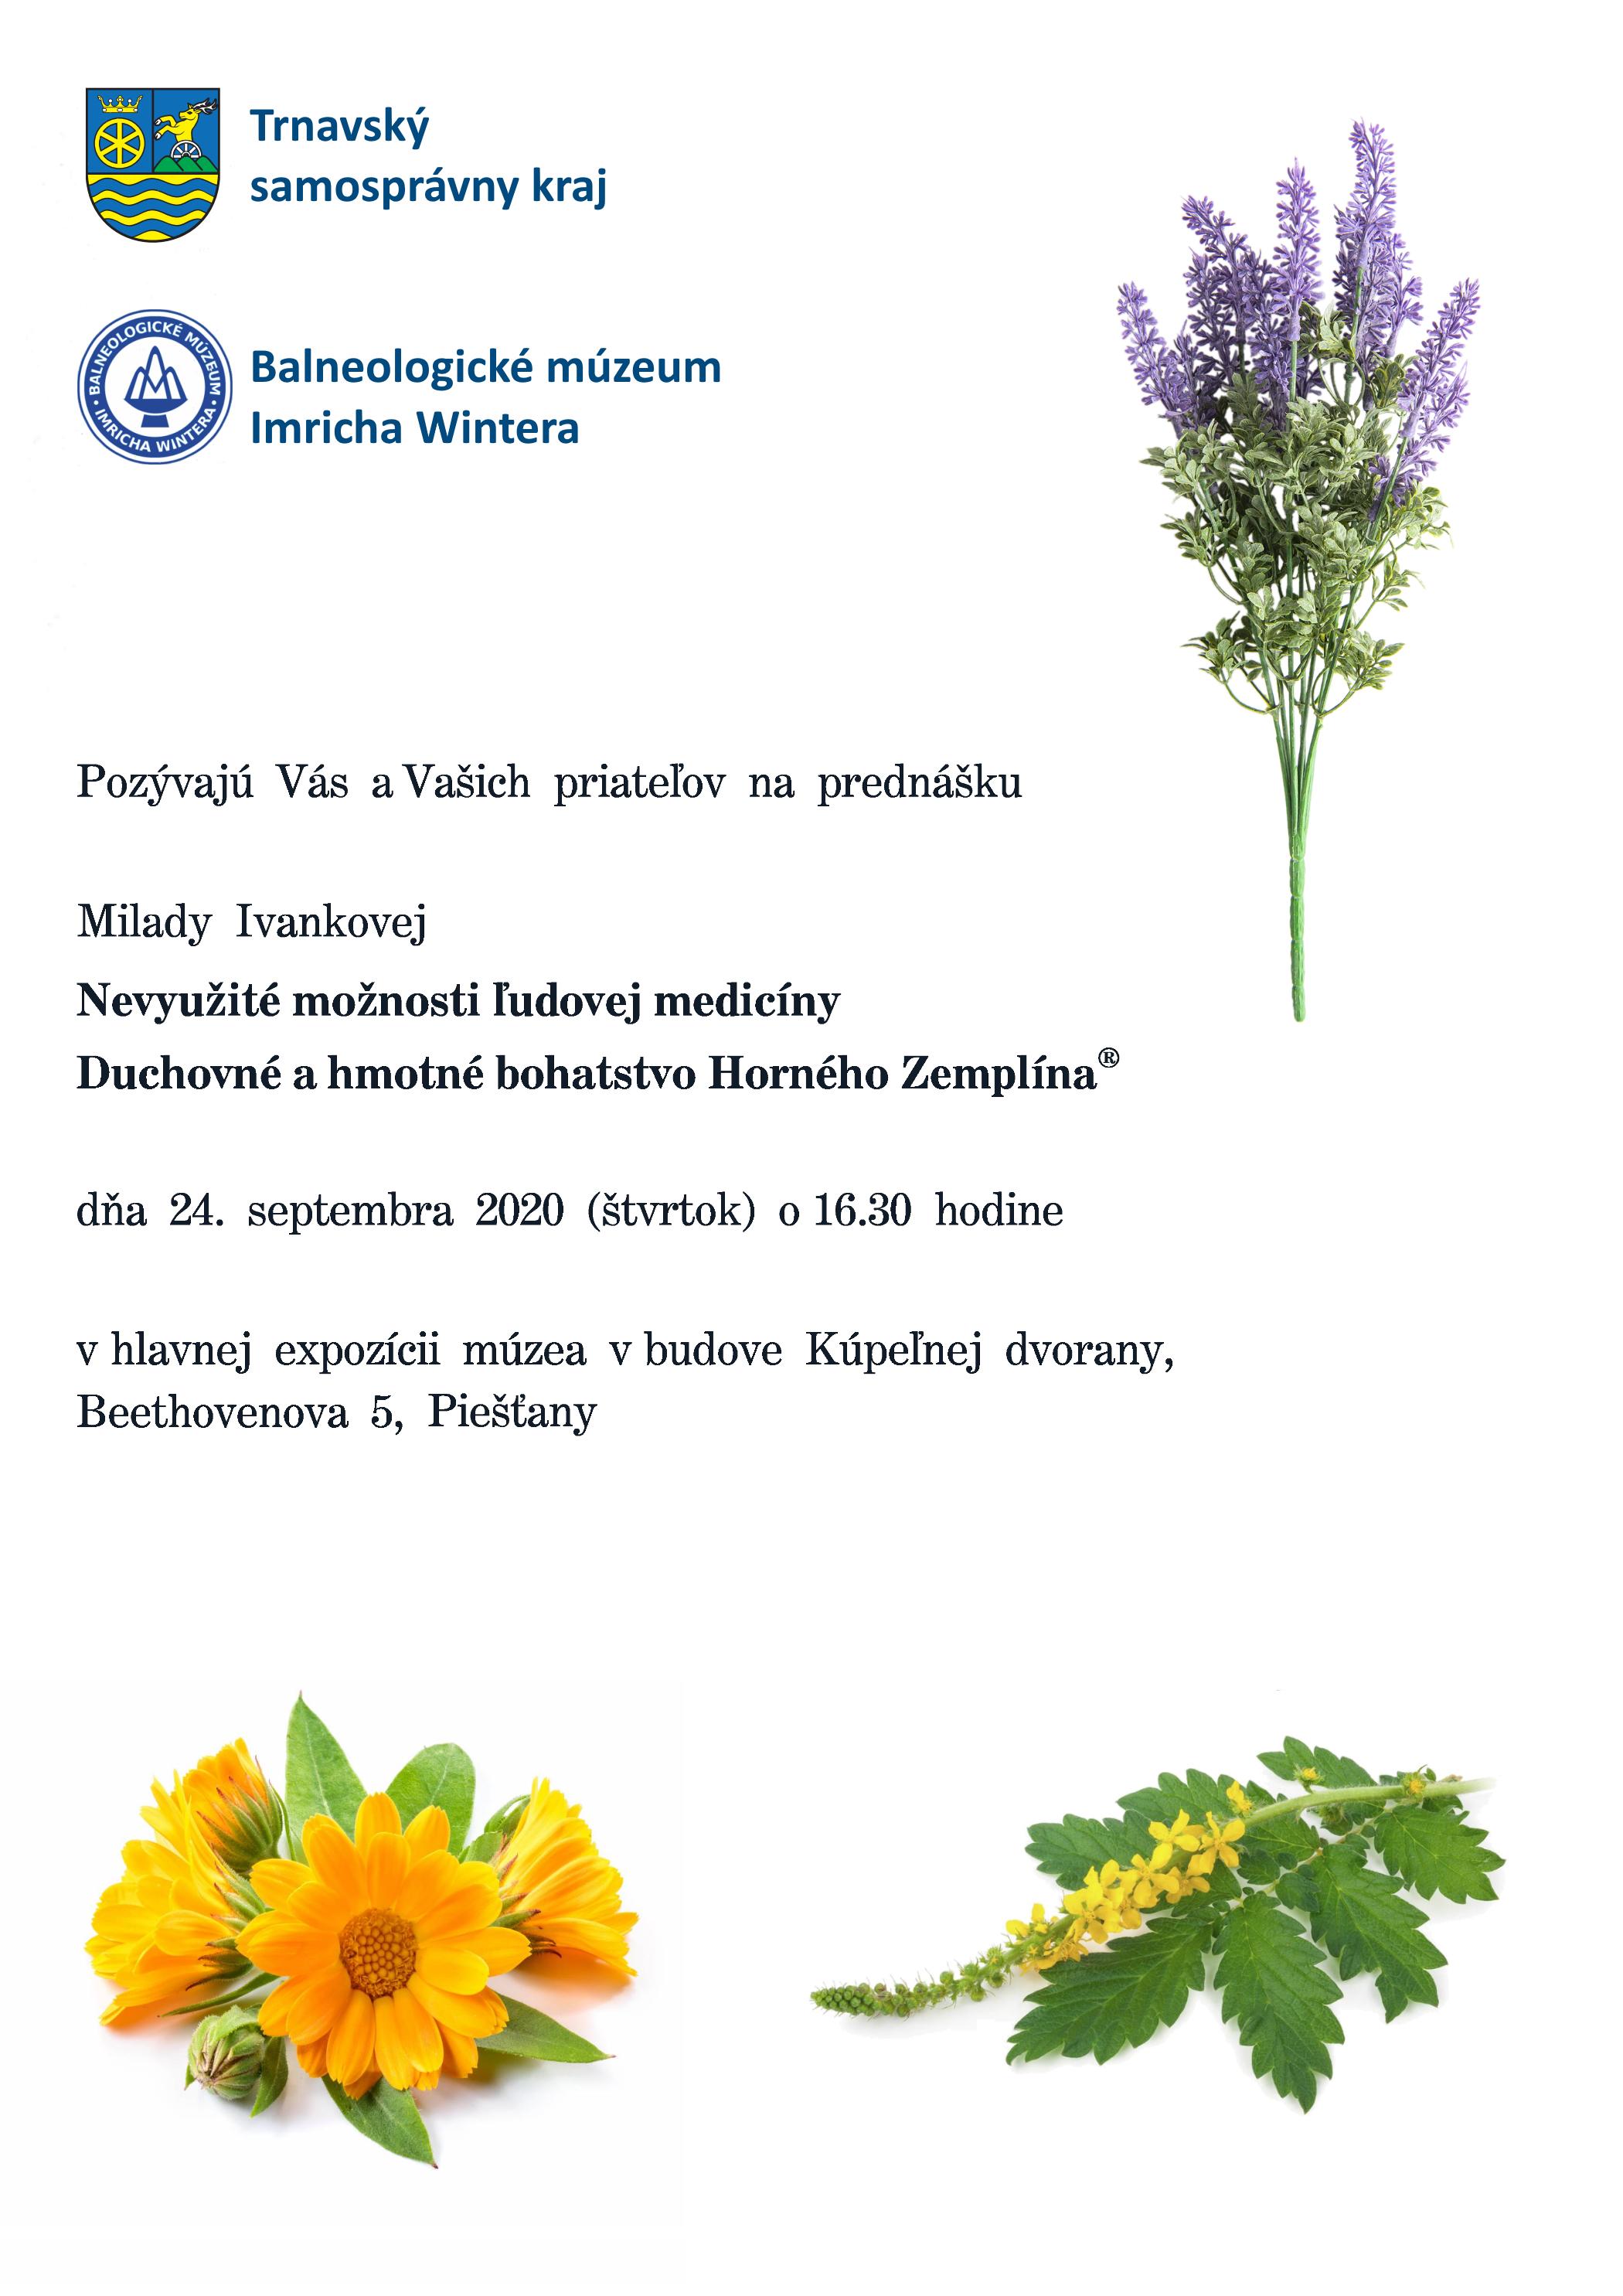 ludova_medicina